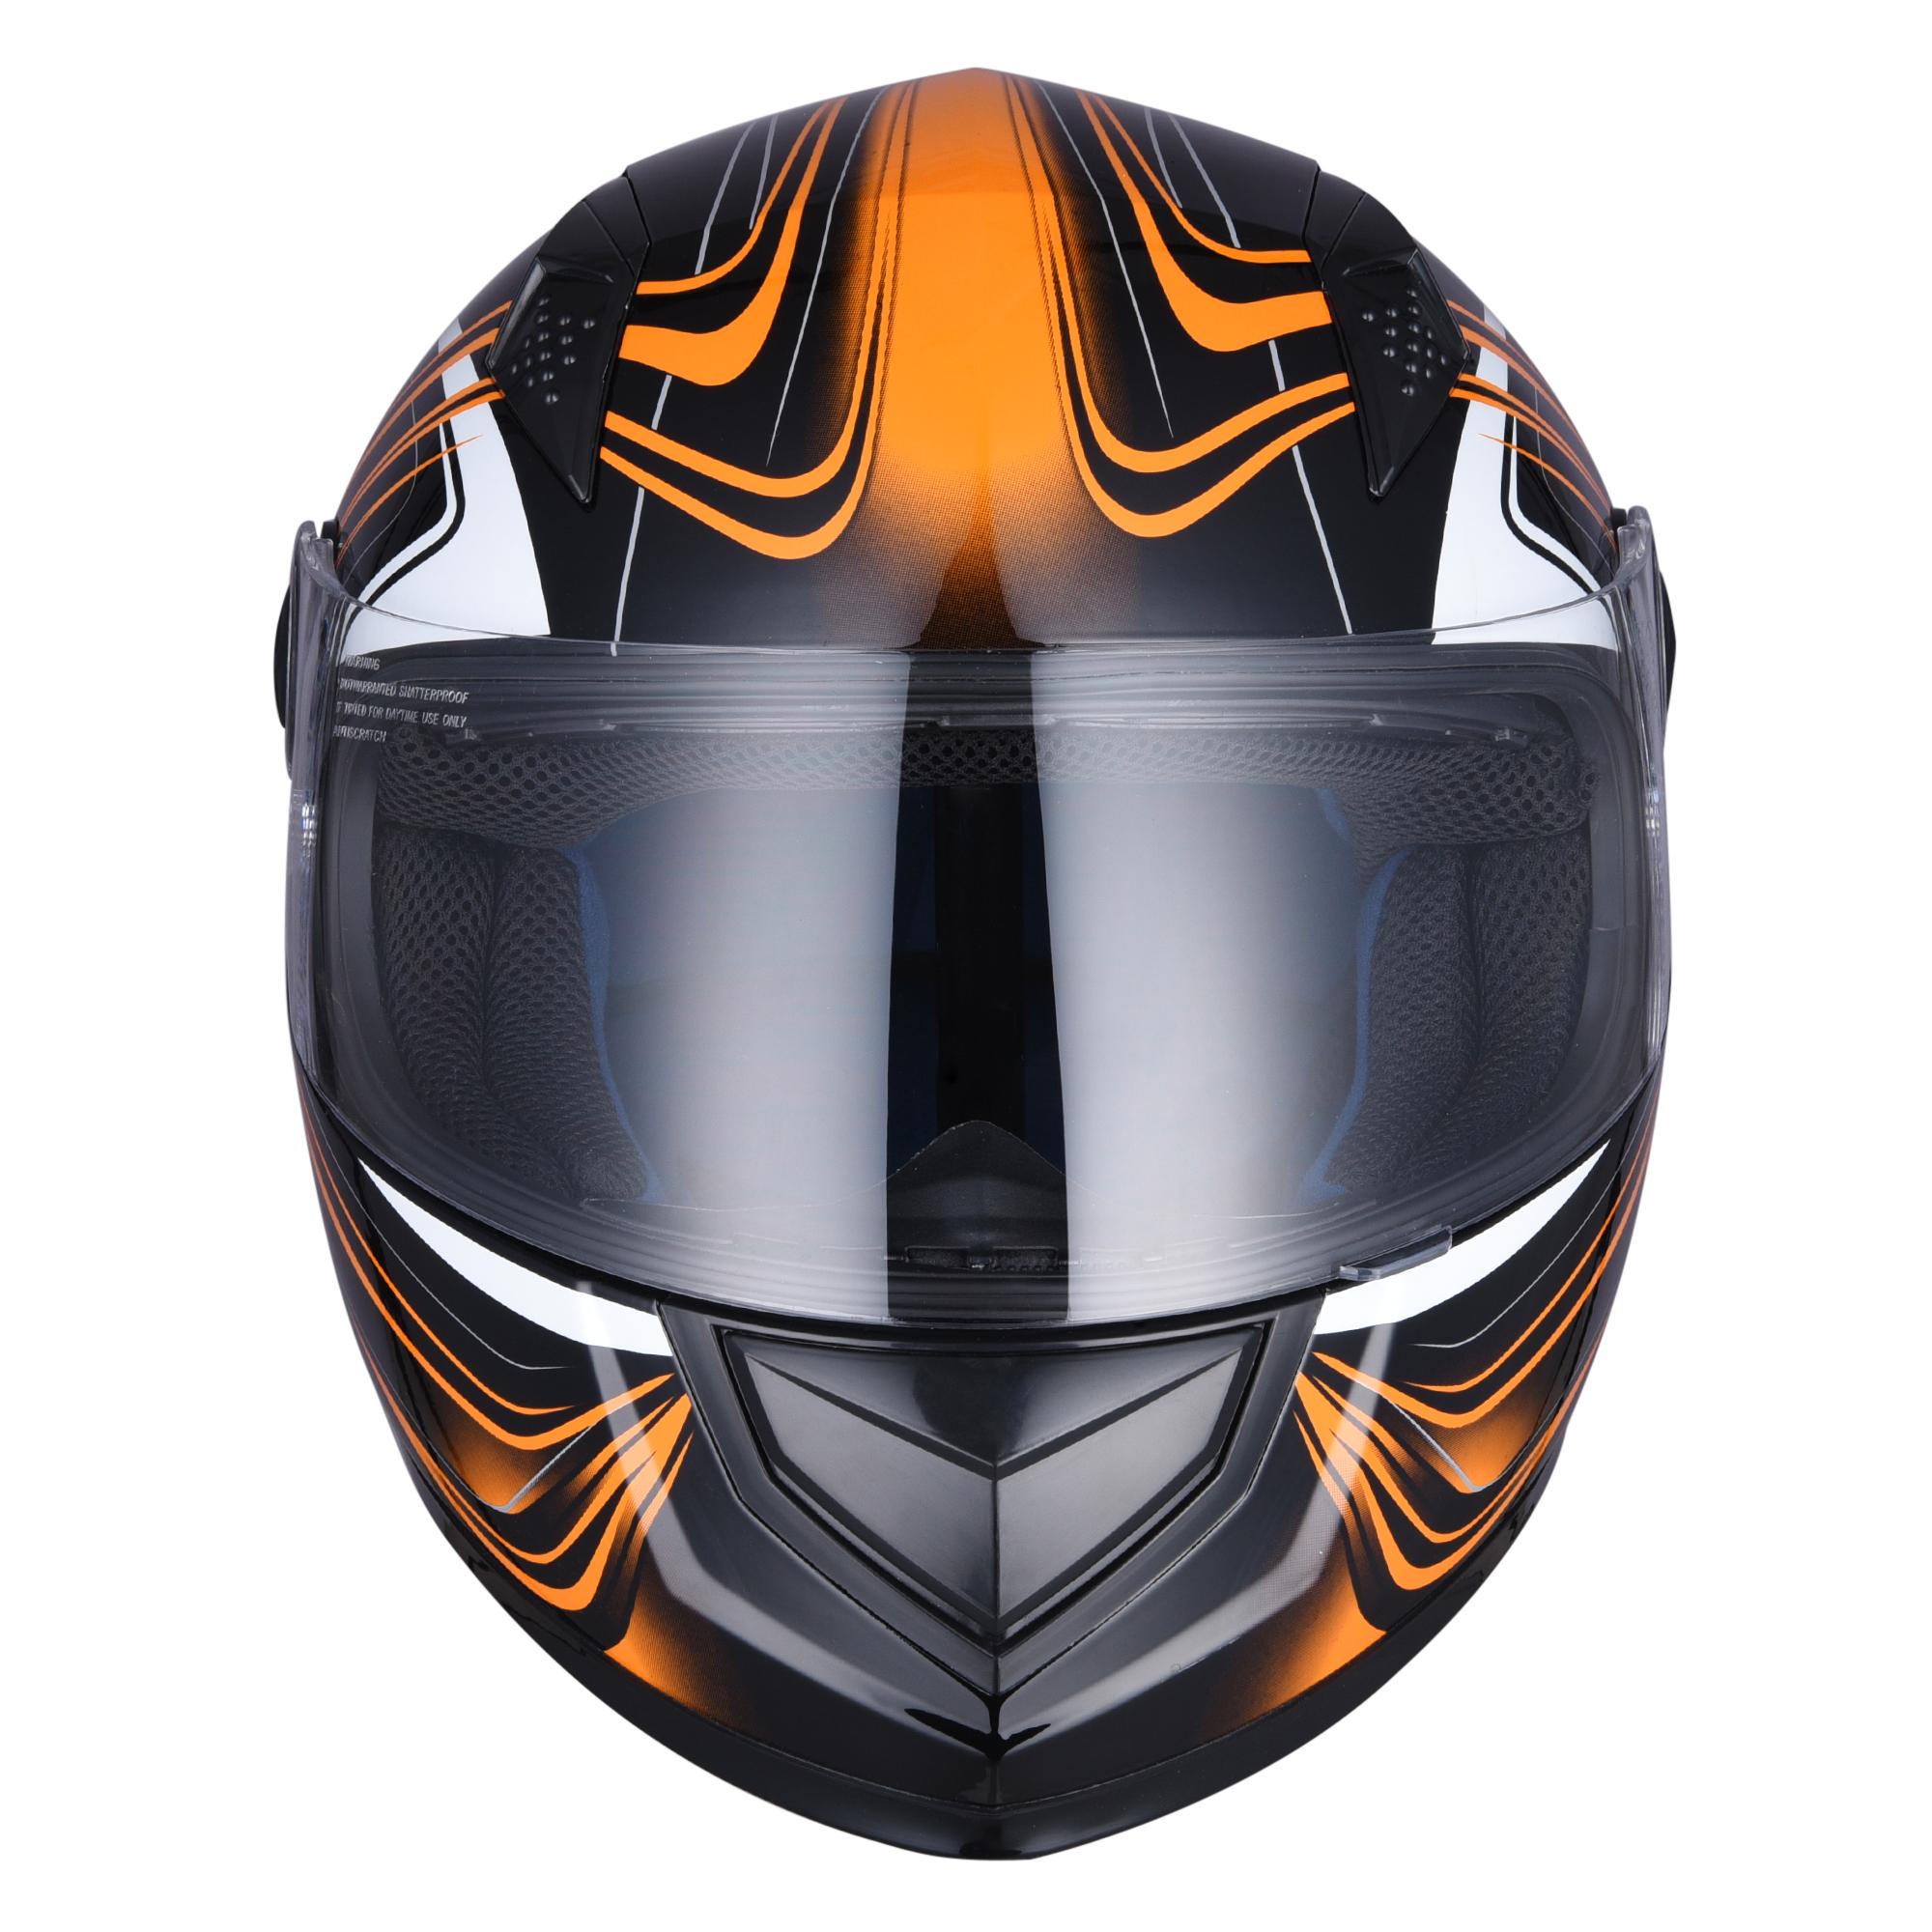 miniature 37 - AHR K12 Full Face Motorcycle Helmet DOT Air Vents Clear Visor Racing S M L XL